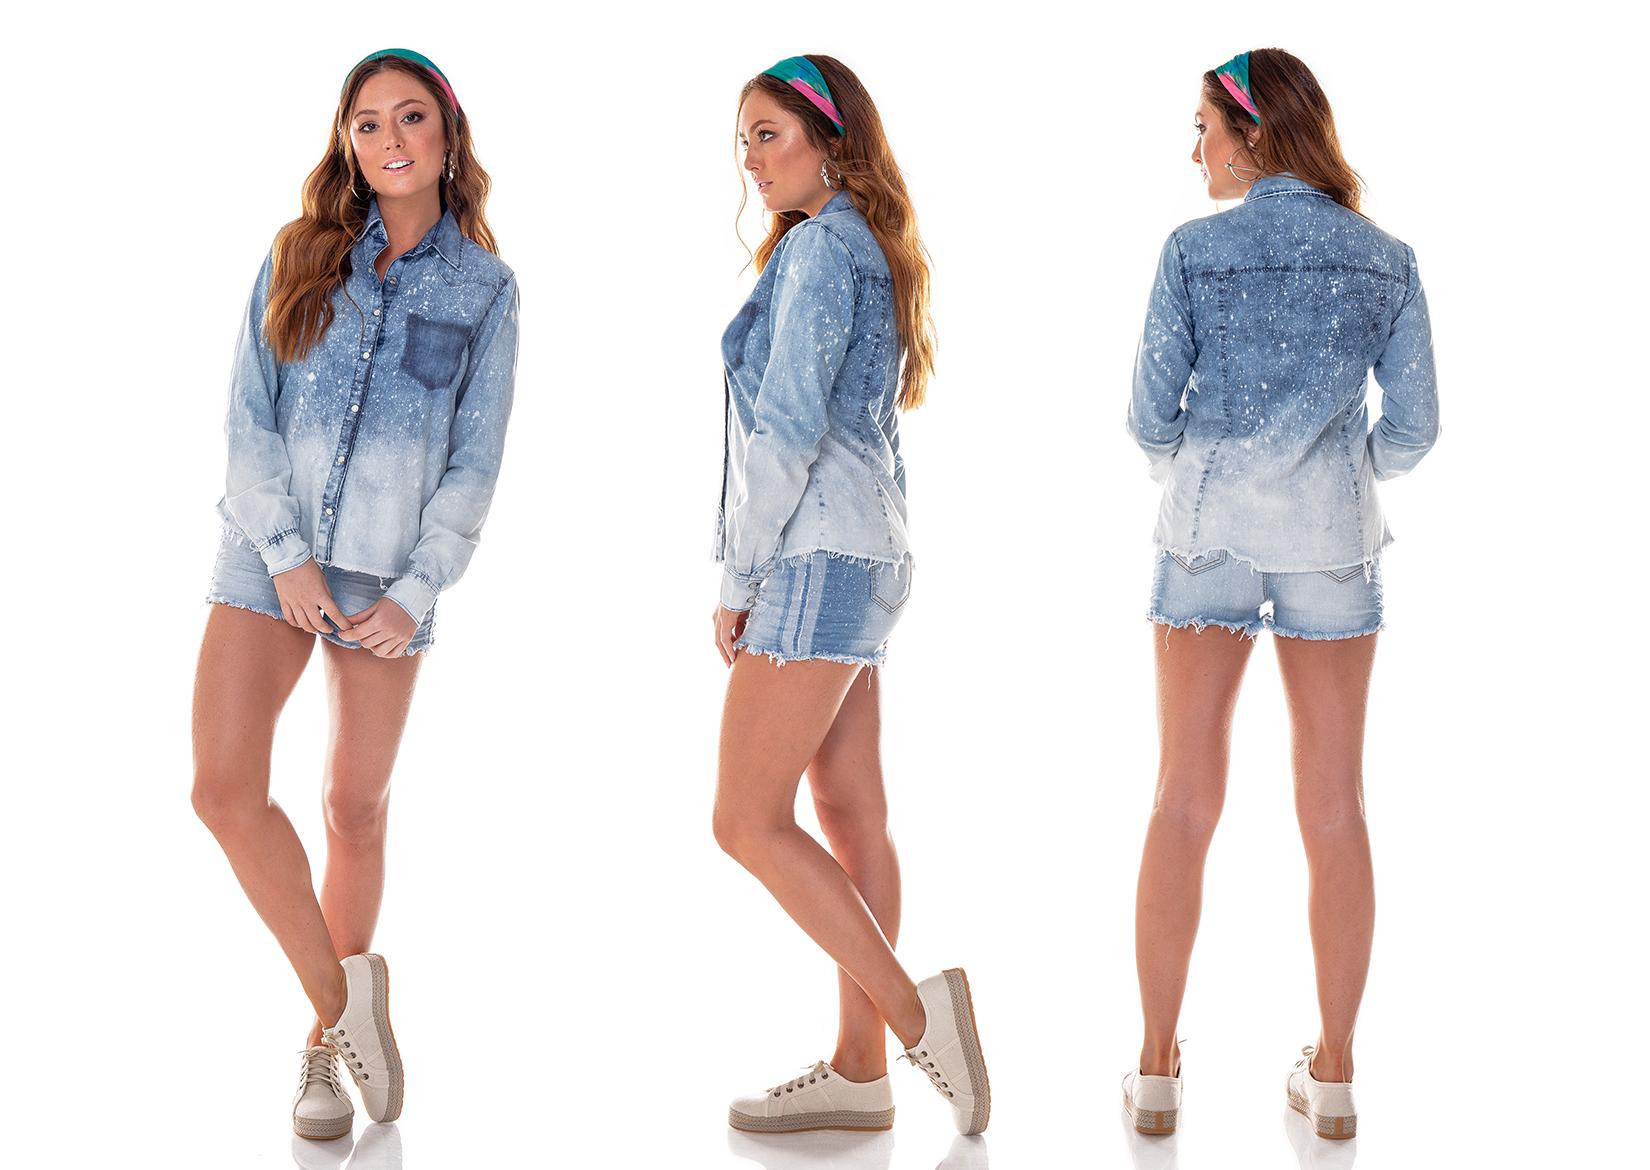 9e0d8bce31 Camisa Solta Jeans Feminina Manga Longa Respingos - DZ11126